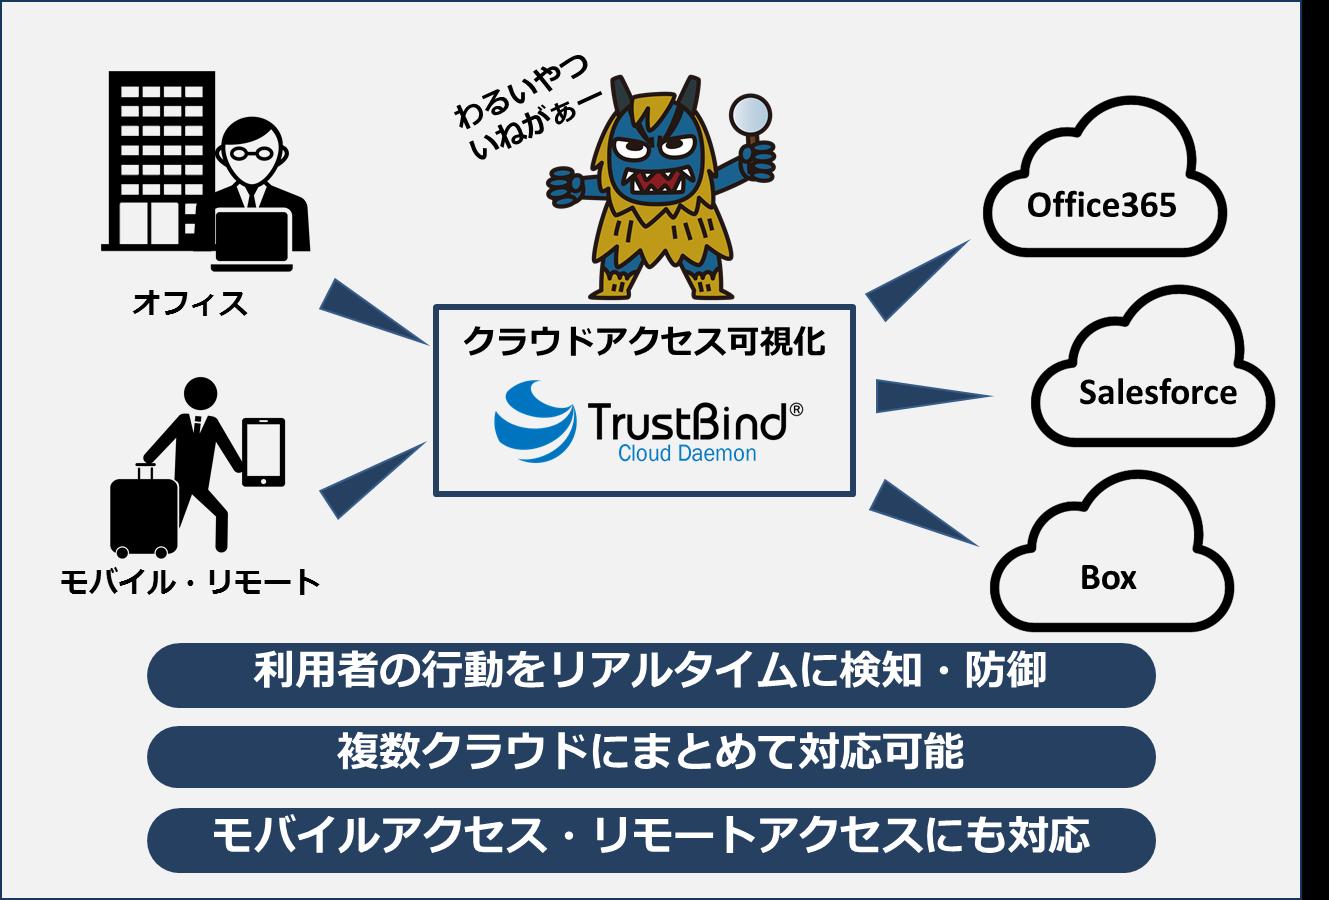 「TrustBind/Cloud Daemon」サービスイメージ